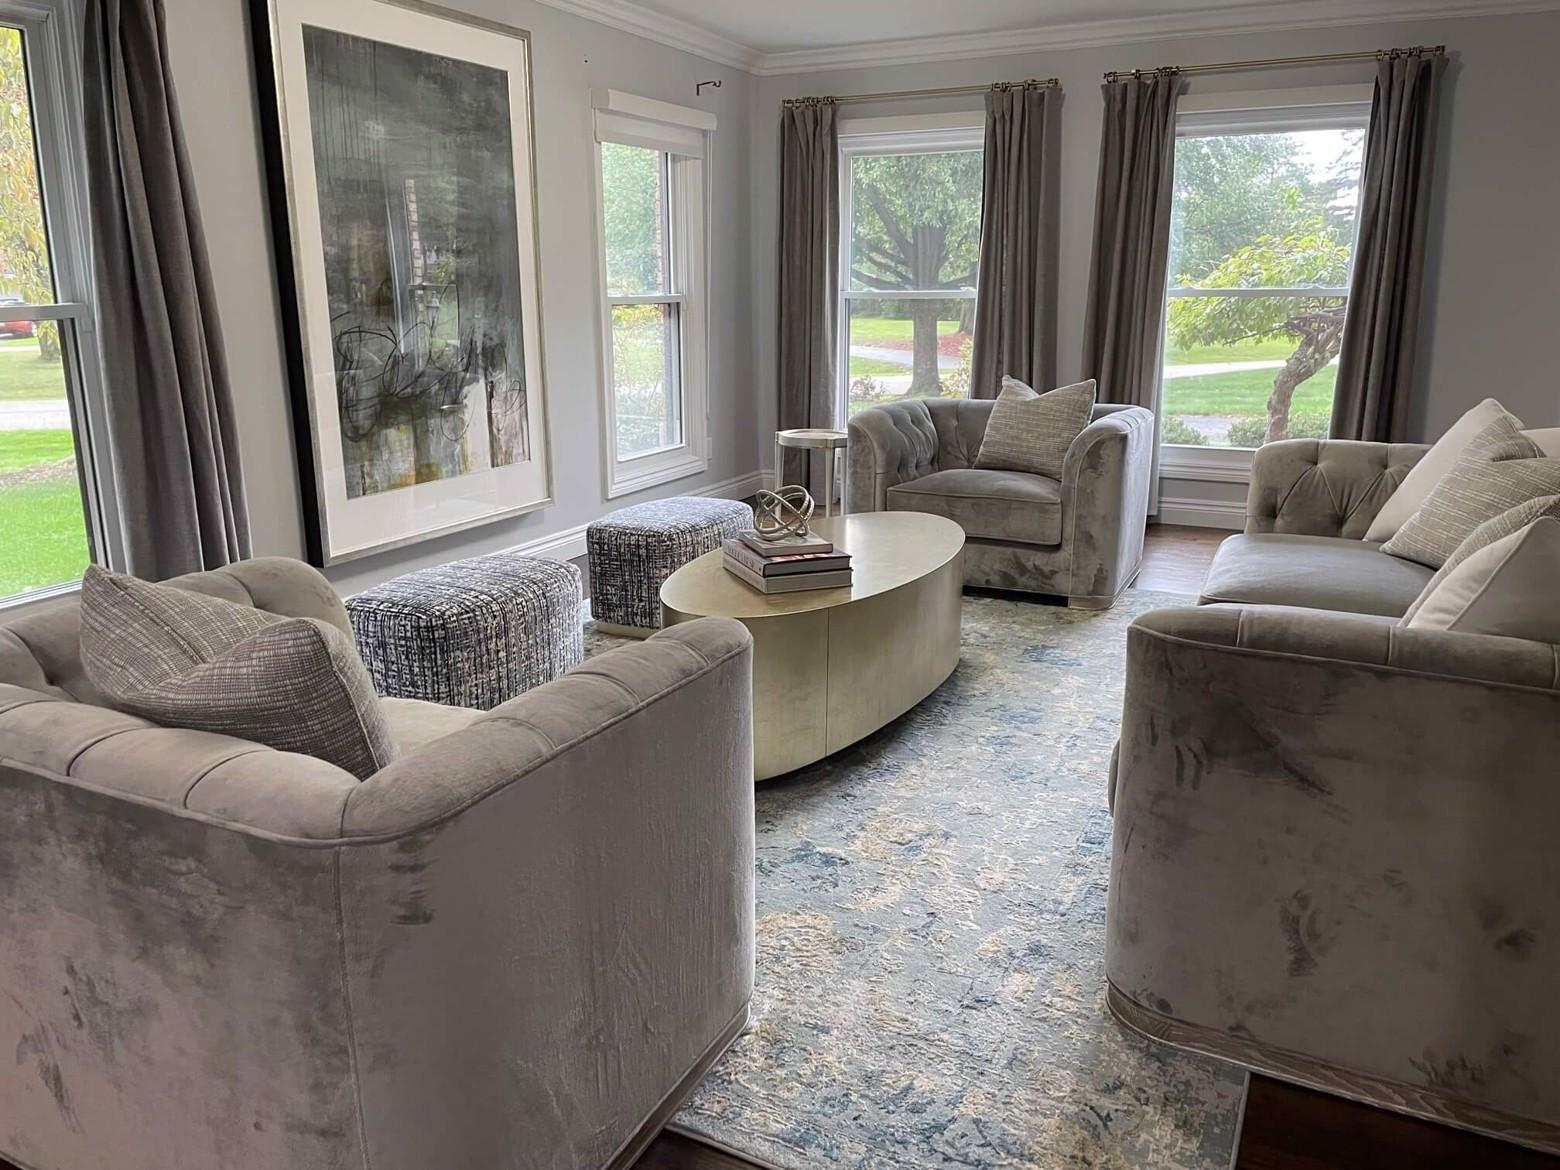 costanza-ellertsson-living-room-3.jpg image